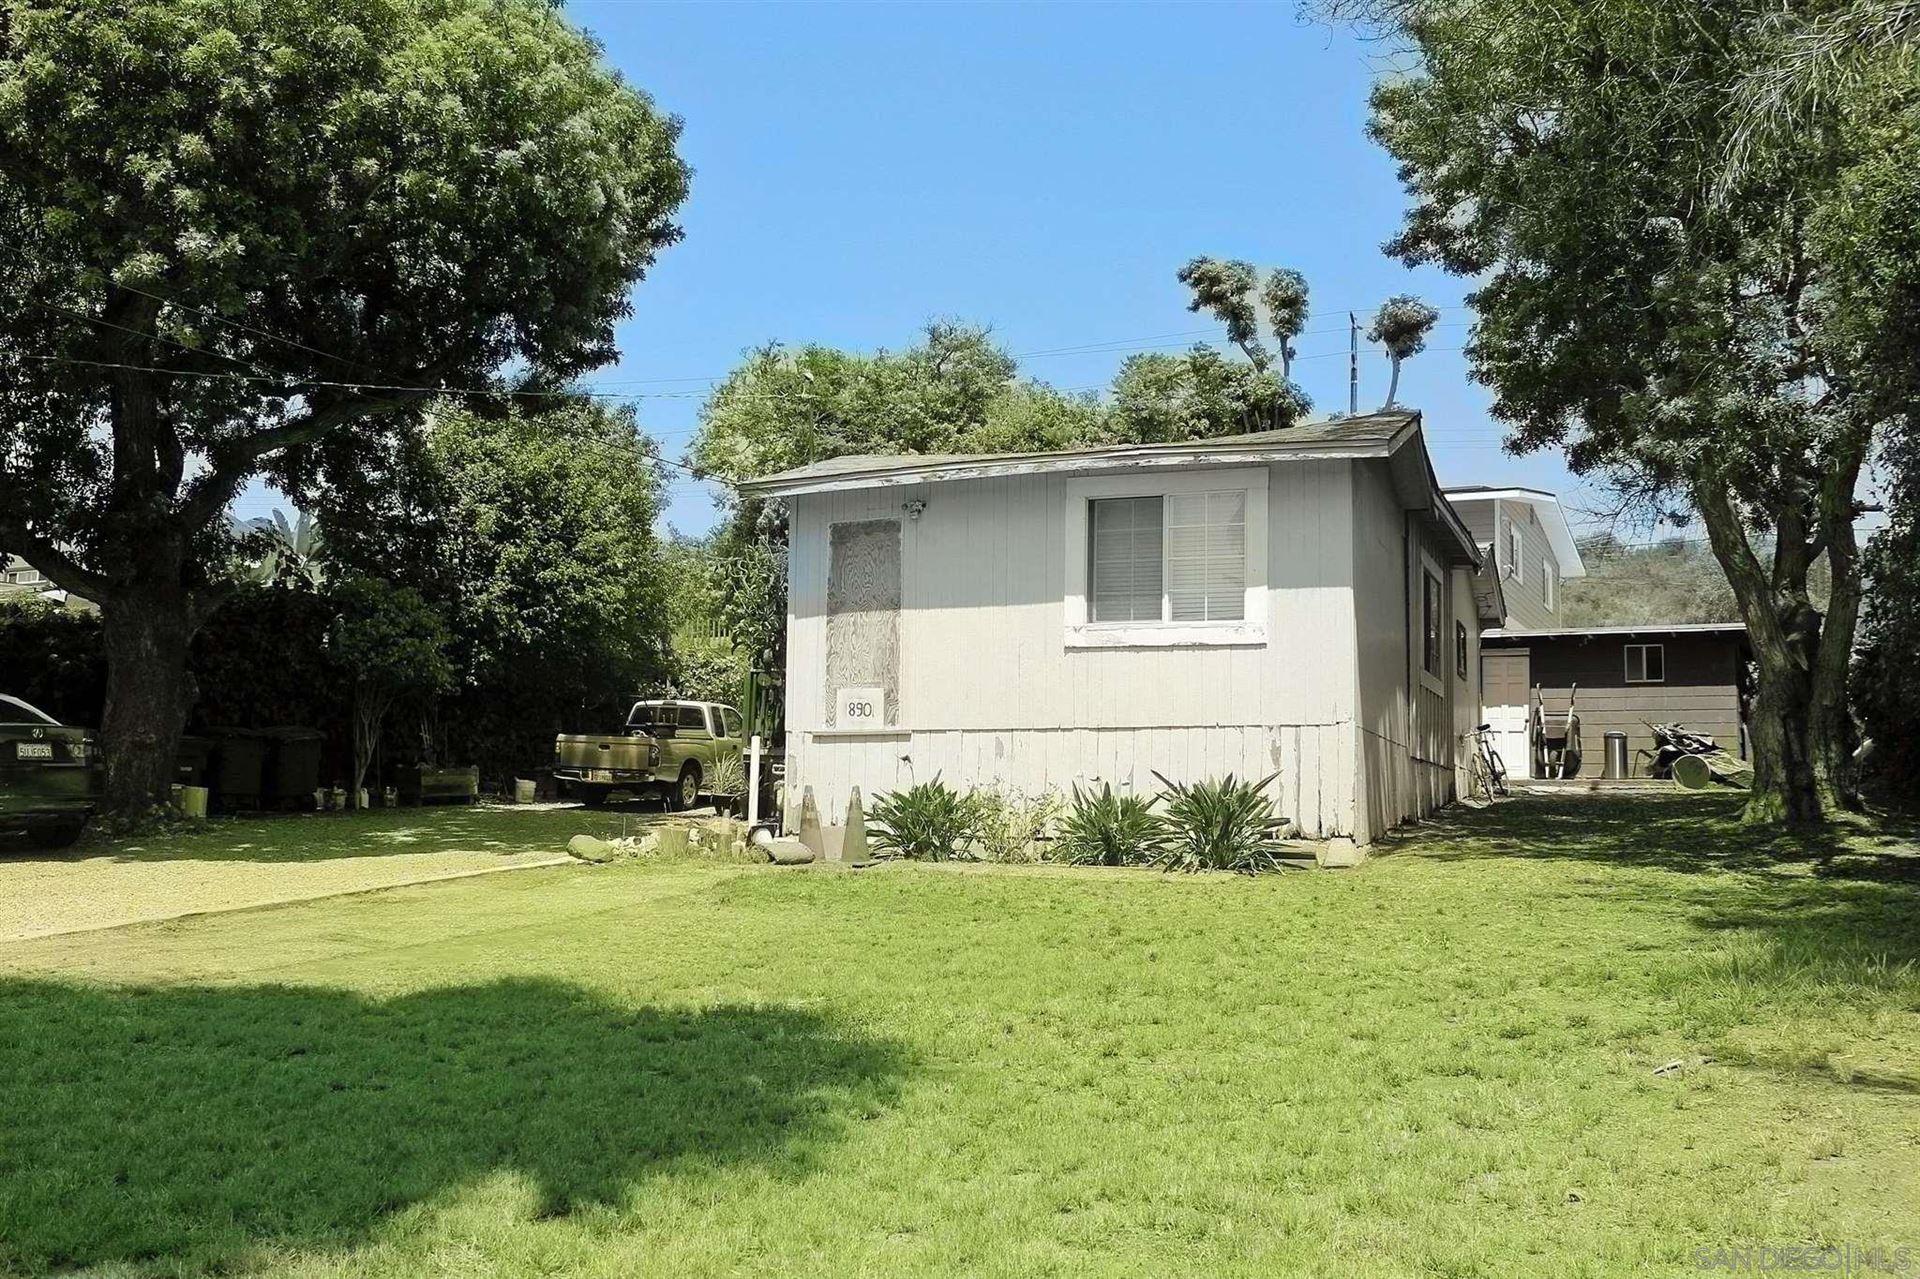 Photo of 890 Juanita Street, Solana Beach, CA 92075 (MLS # 210020344)